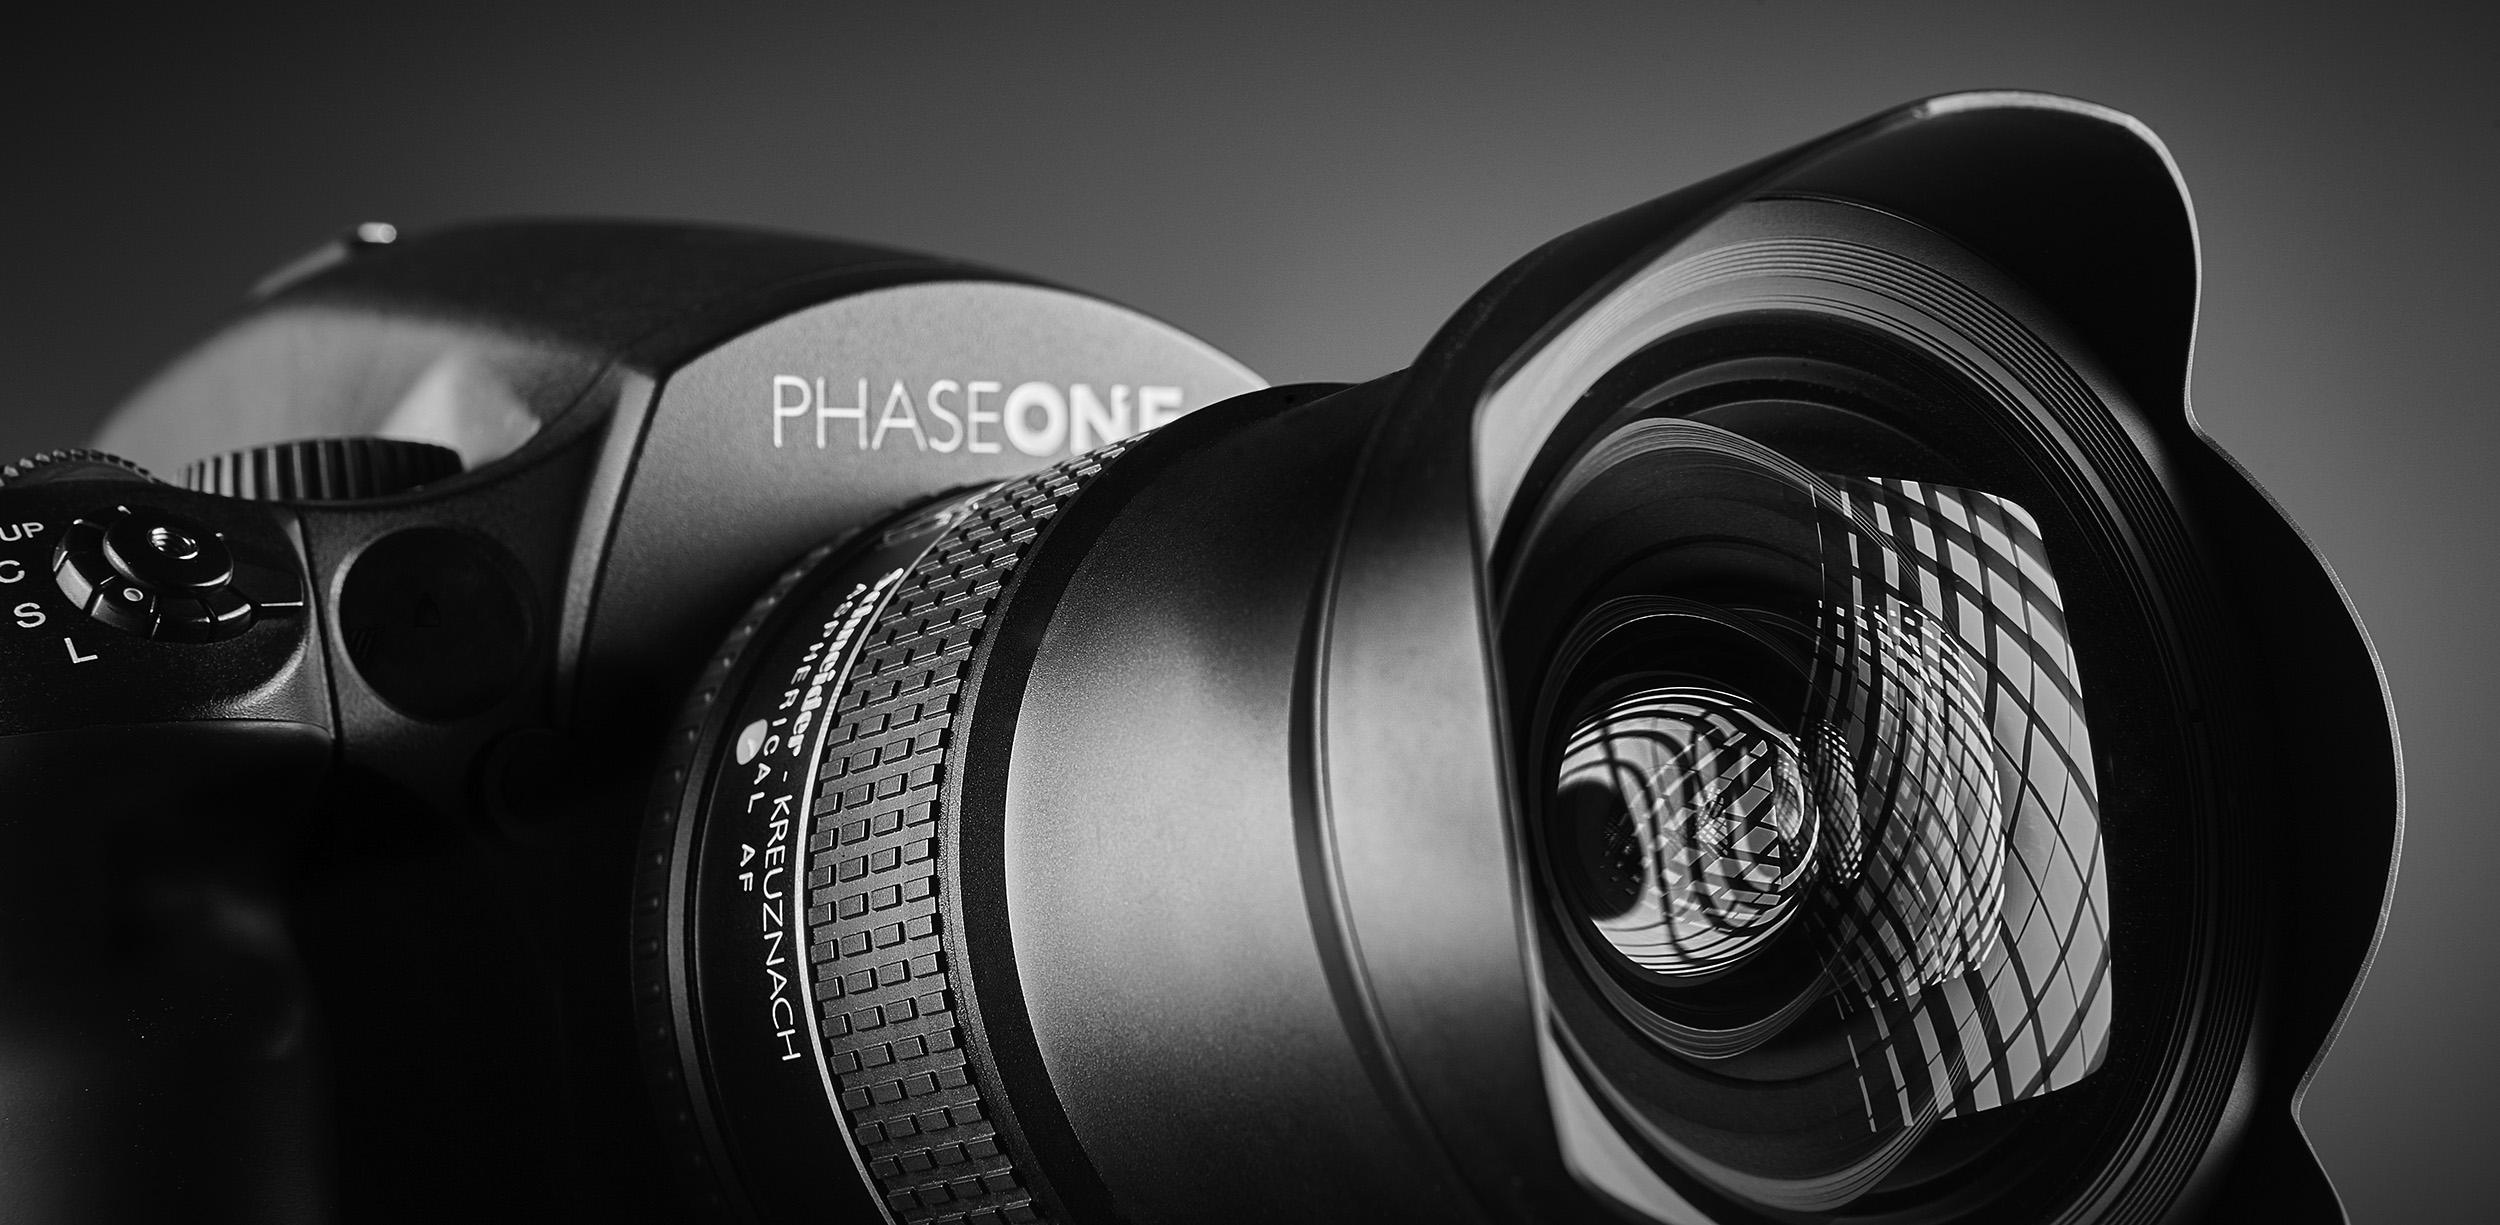 Fotostudio, Phase One, Fotografen, België, Limburg, Paul Delaet, Fotografisch atelier, commercieel, advertising, fotografie